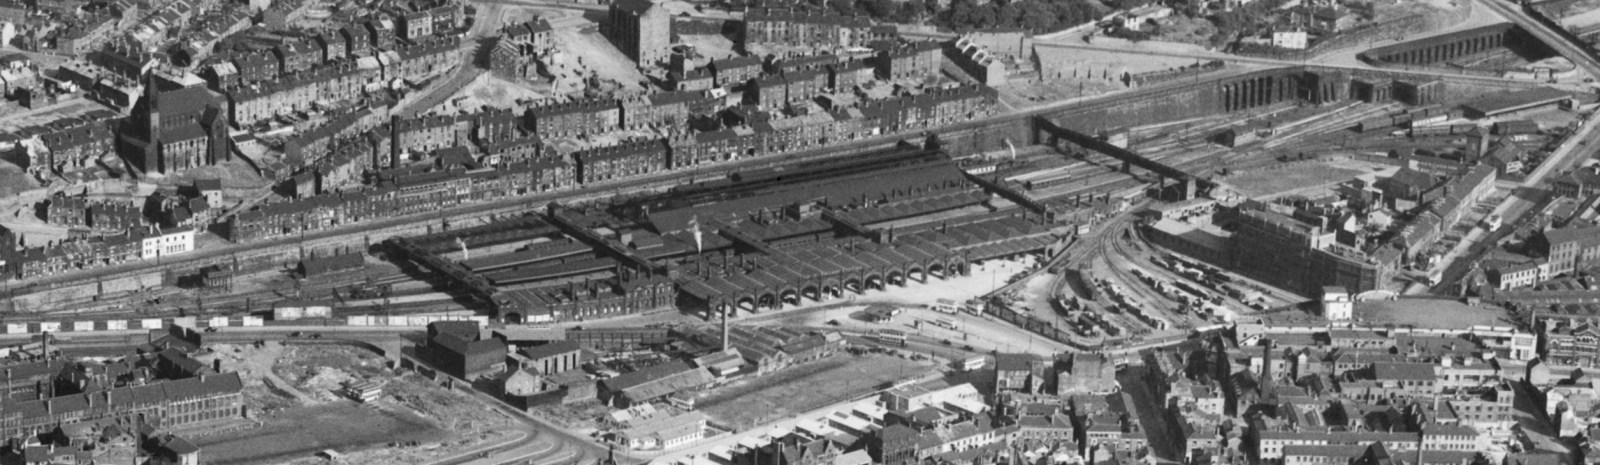 Midland Station 26 August 1950.jpg